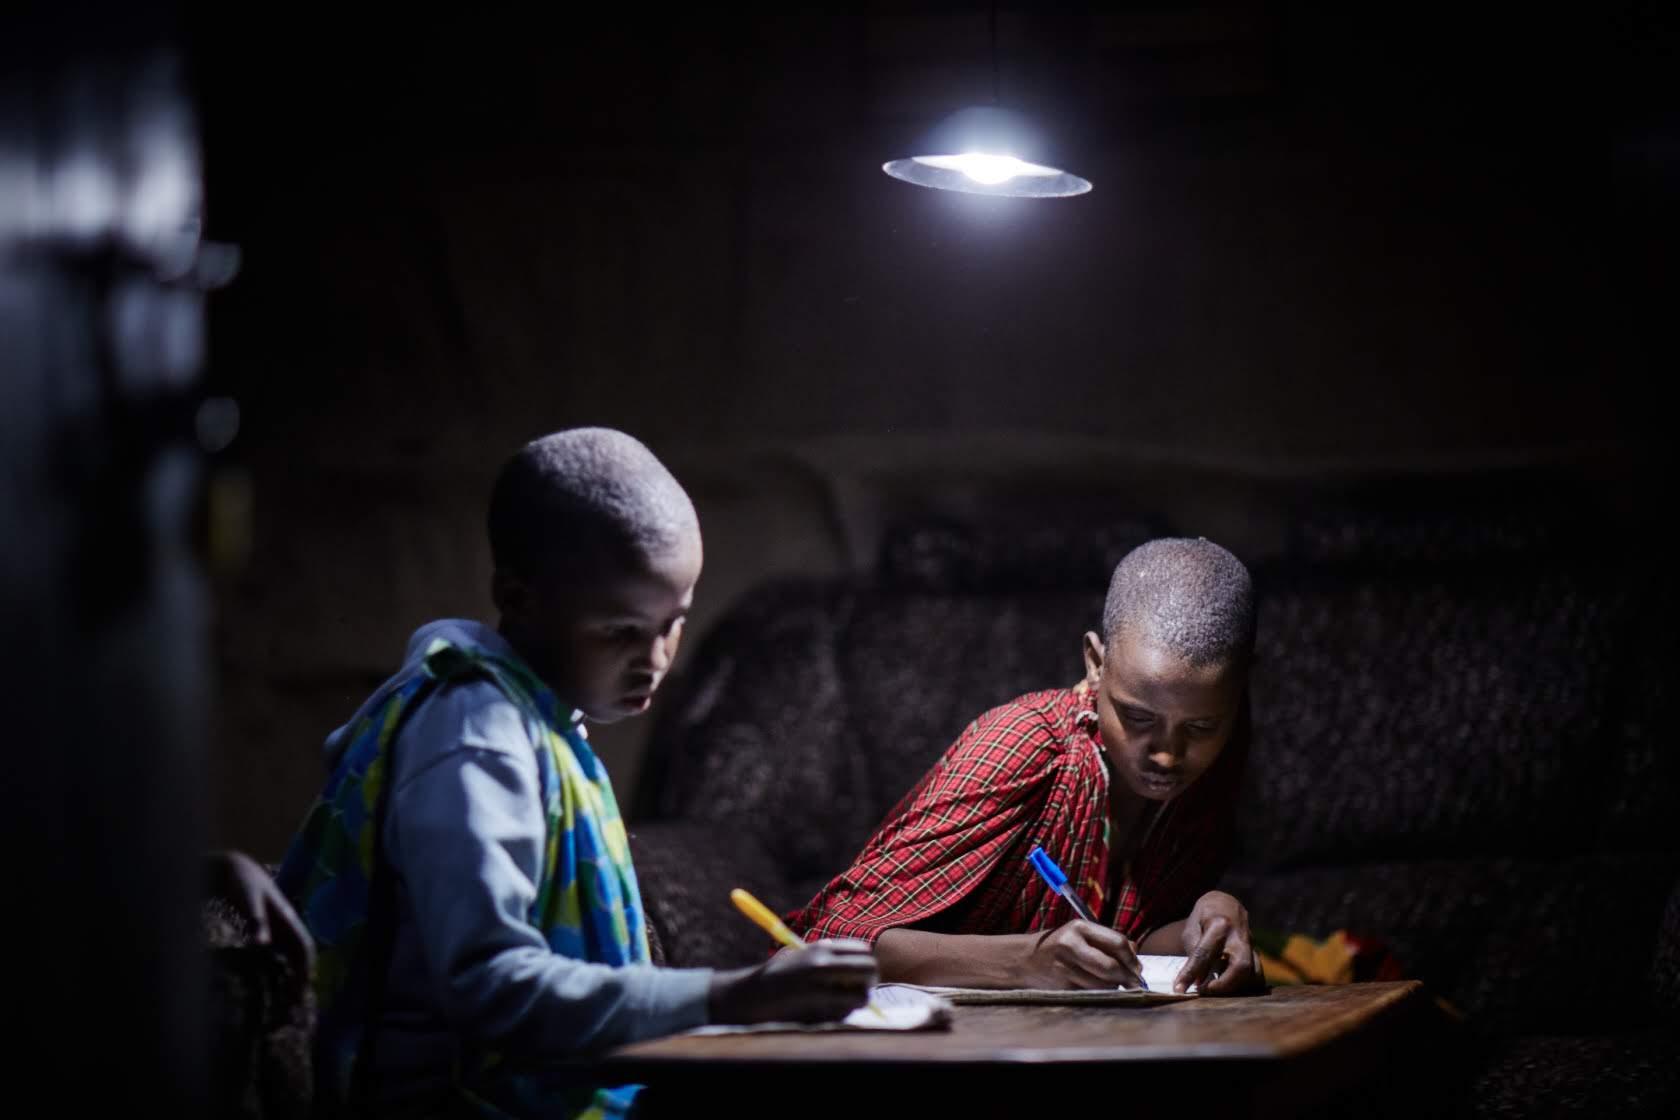 Zola electric children working light